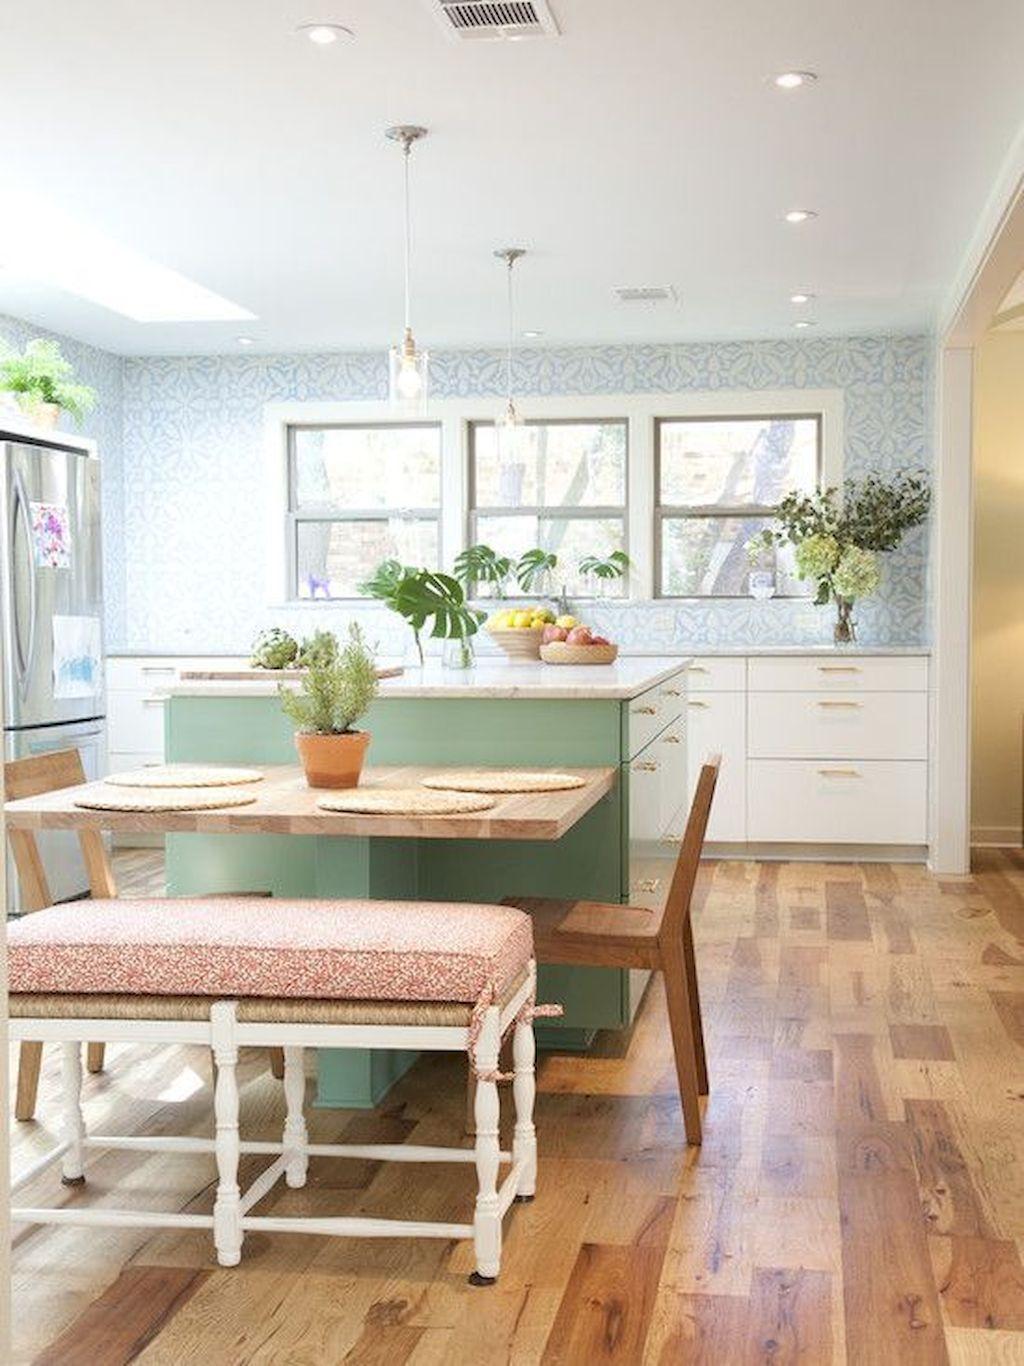 Stunning Small Island Kitchen Table Ideas Home To Z Kitchen Island Table Combination Kitchen Island Dining Table Kitchen Dining Room Combo